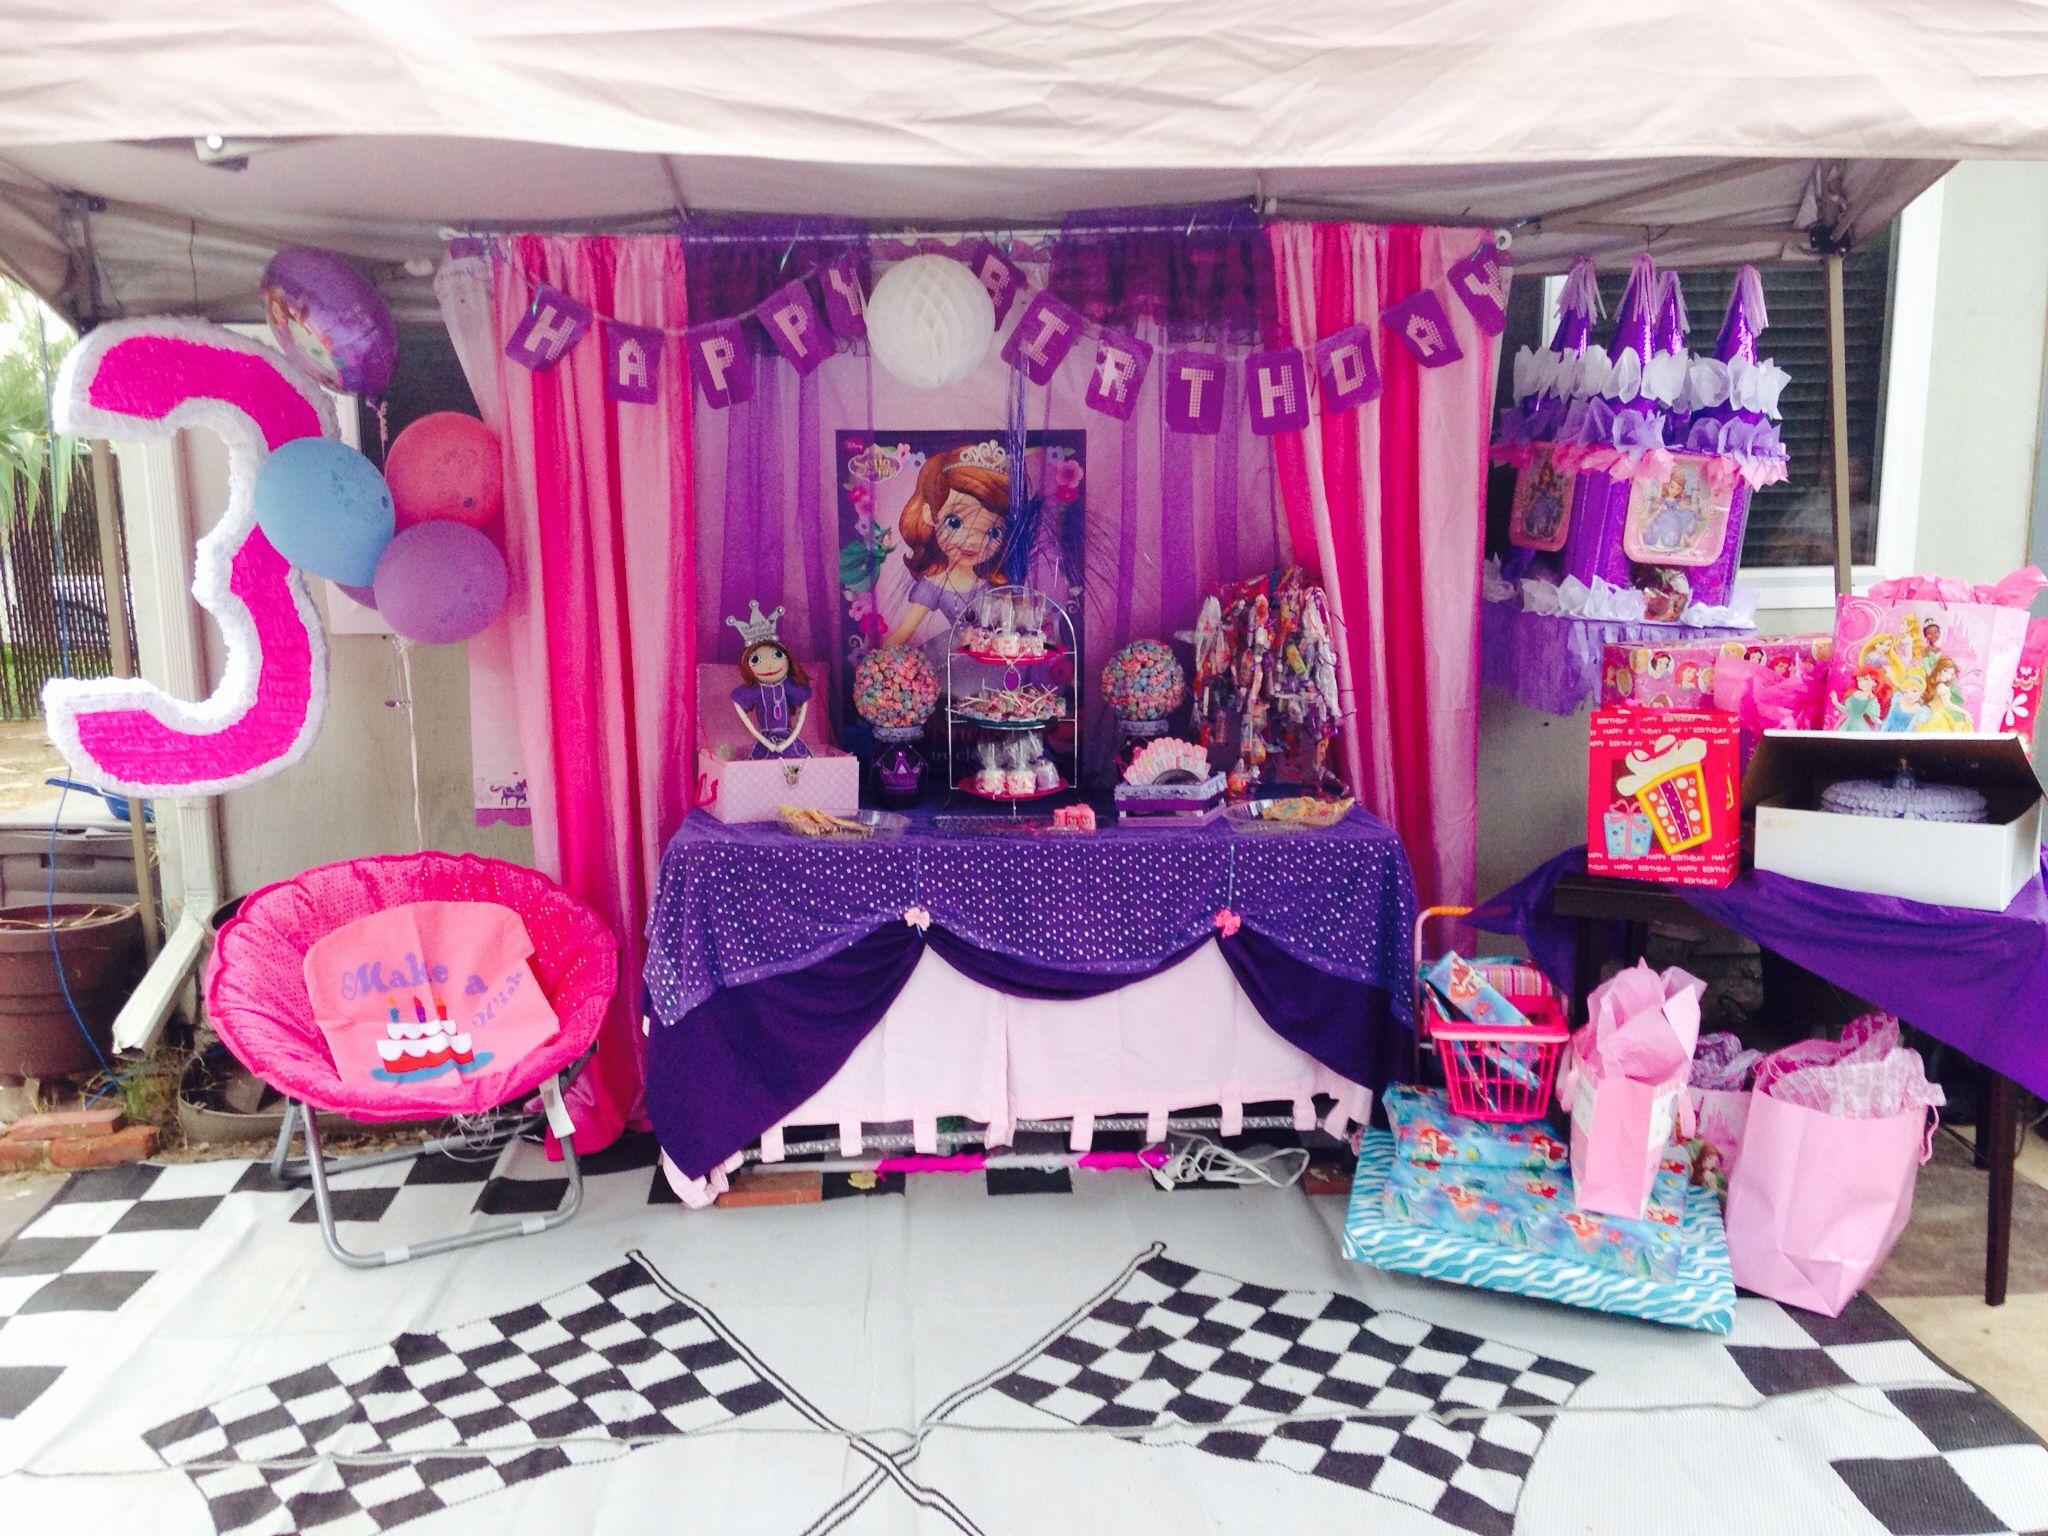 Princess sofia party ideas party ideas pinterest - Ideas para fiestas infantiles en casa ...